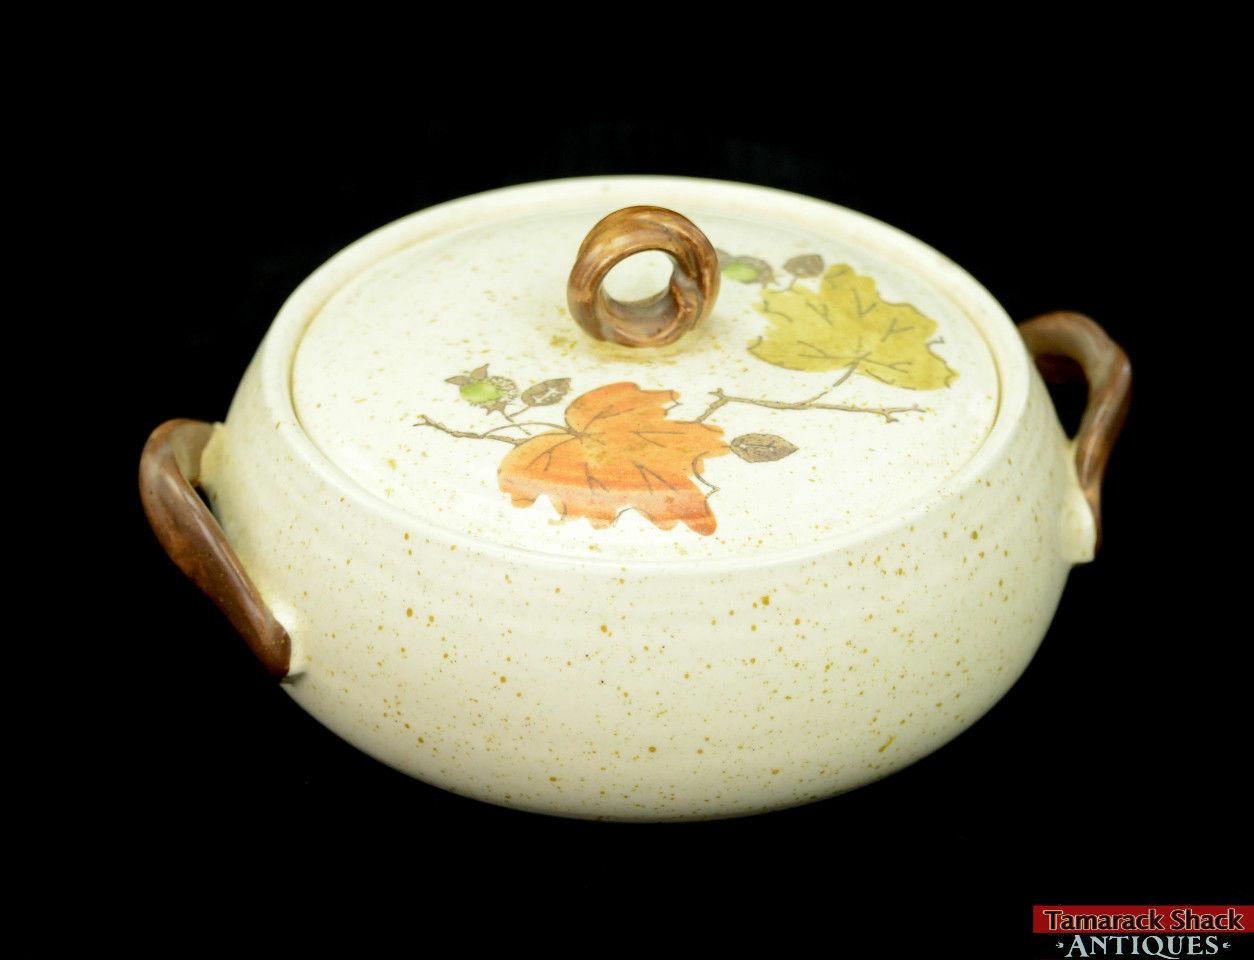 VTG-6-pc-Metlox-Poppytrail-Woodland-Gold-Pitcher-Vegetable-Bowl-Serving-Platter-291536637106-6.jpg